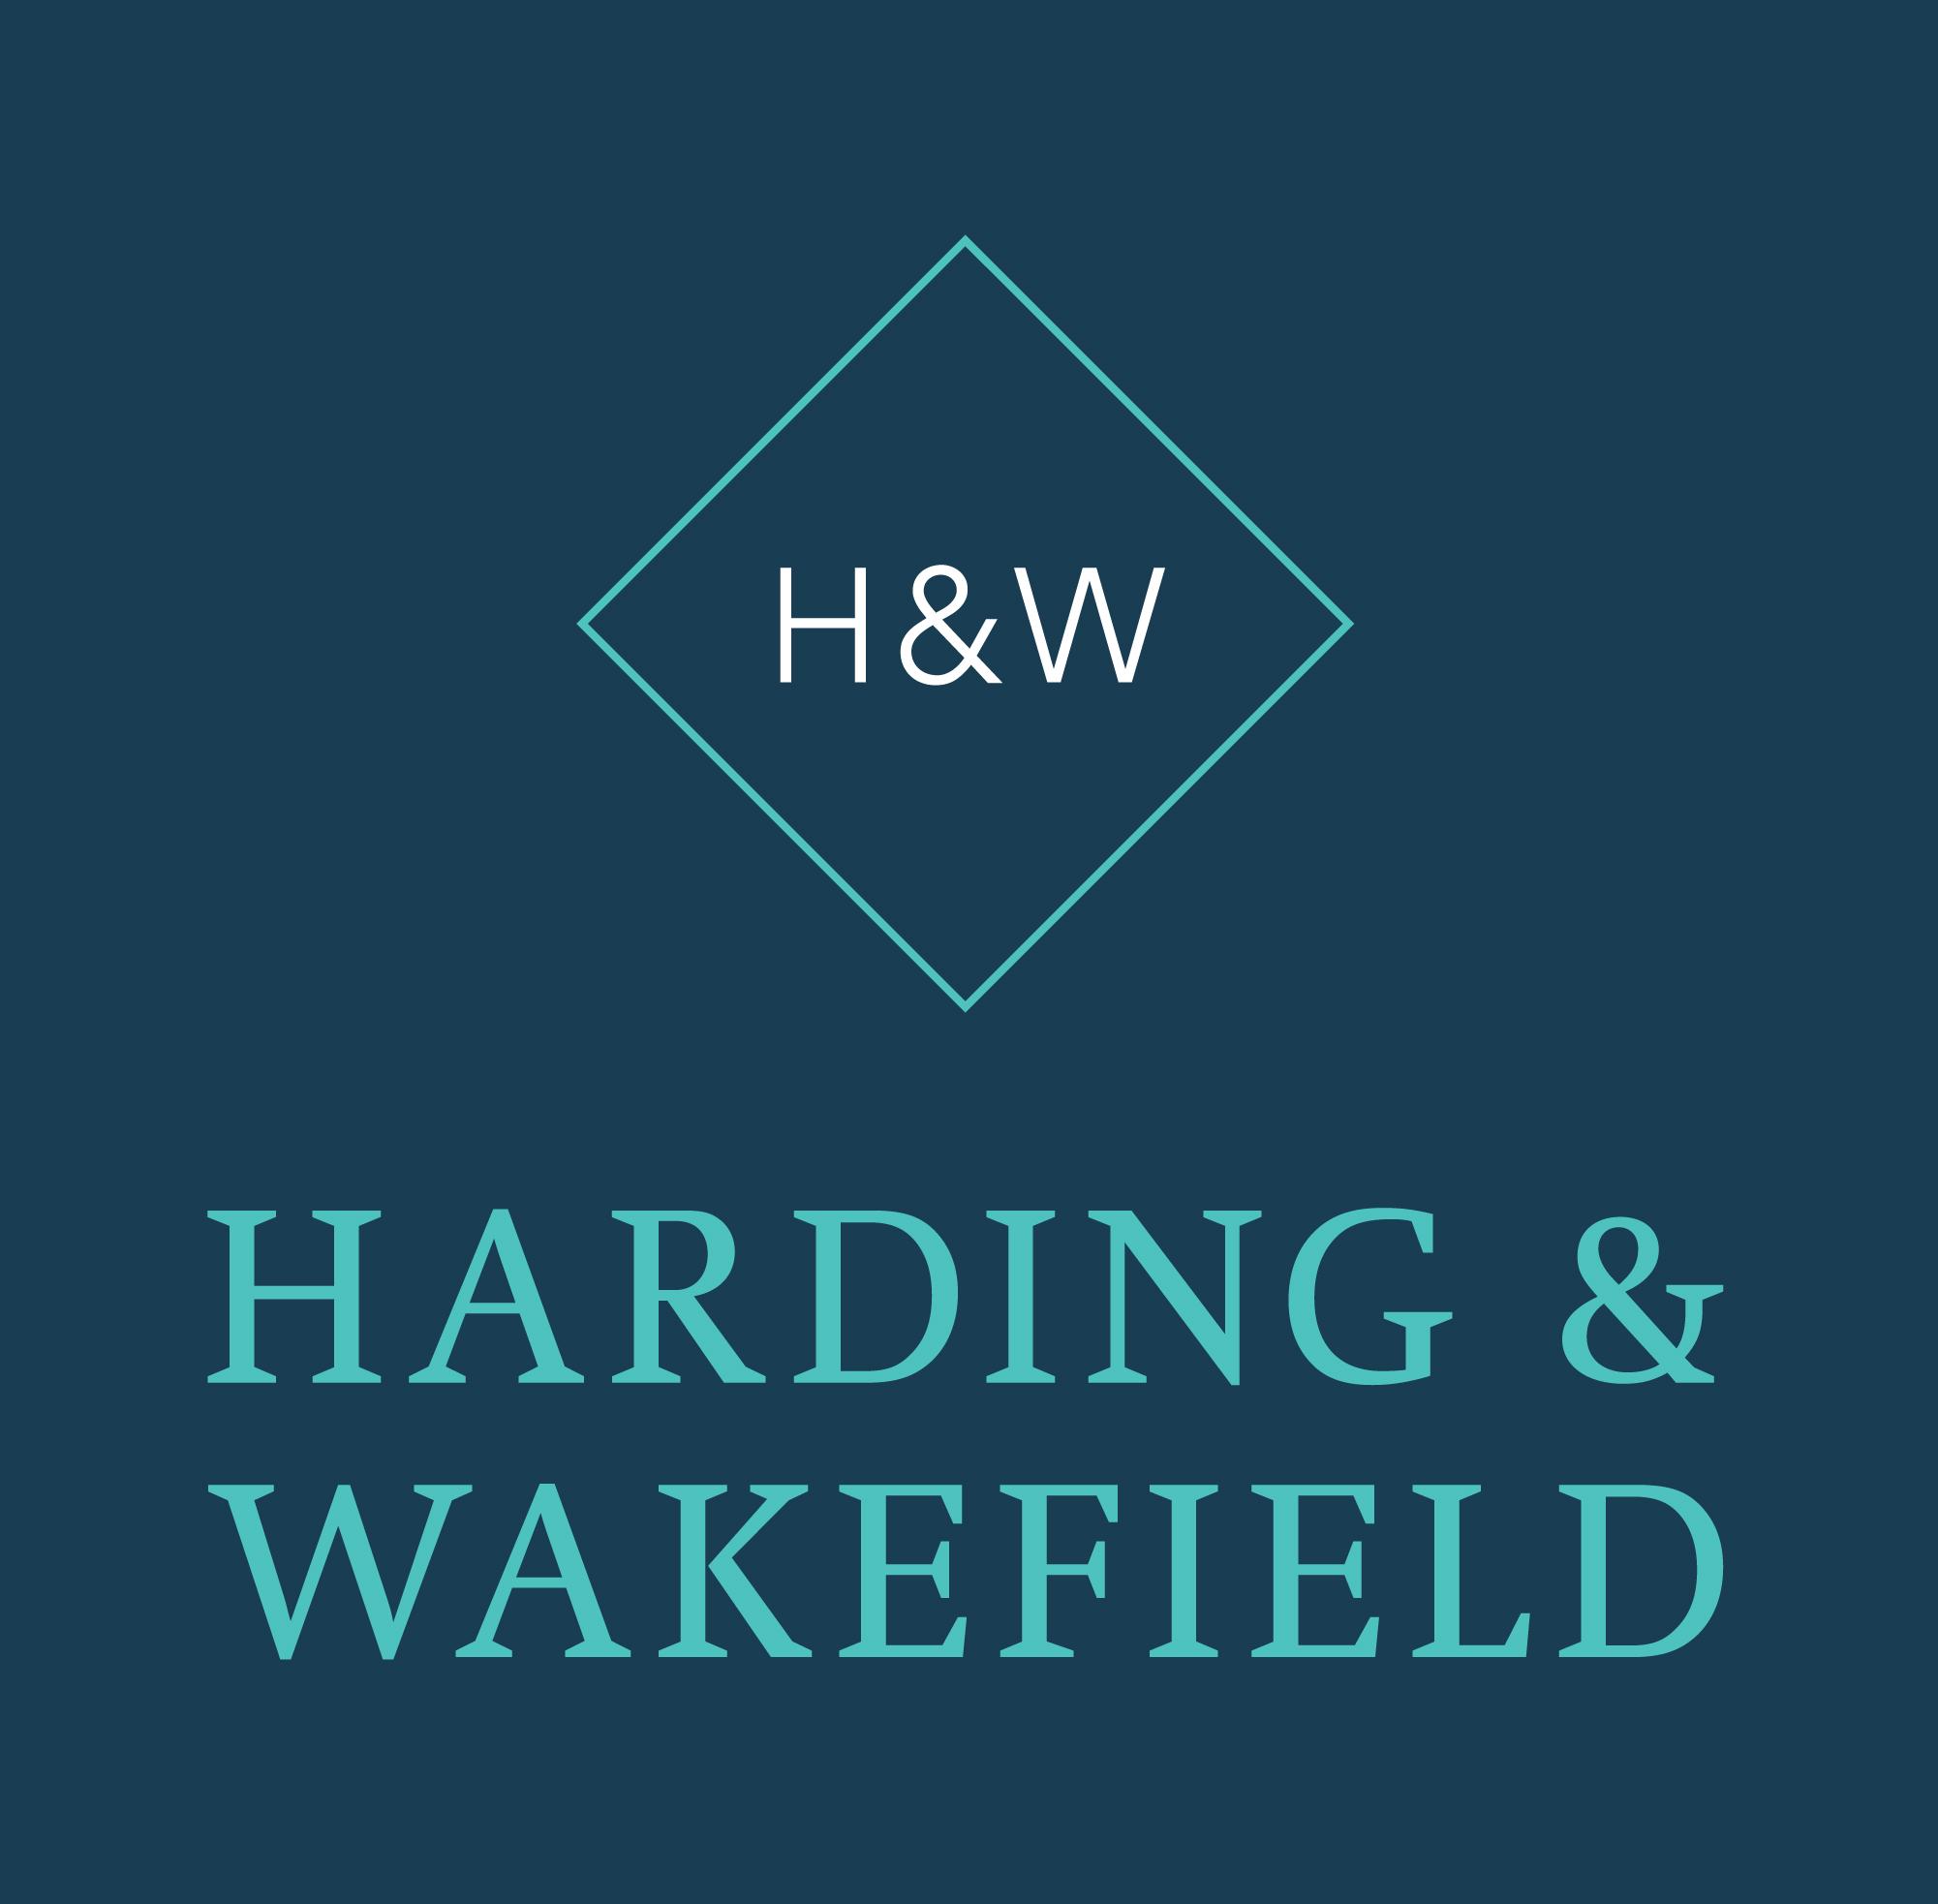 Harding & Wakefield